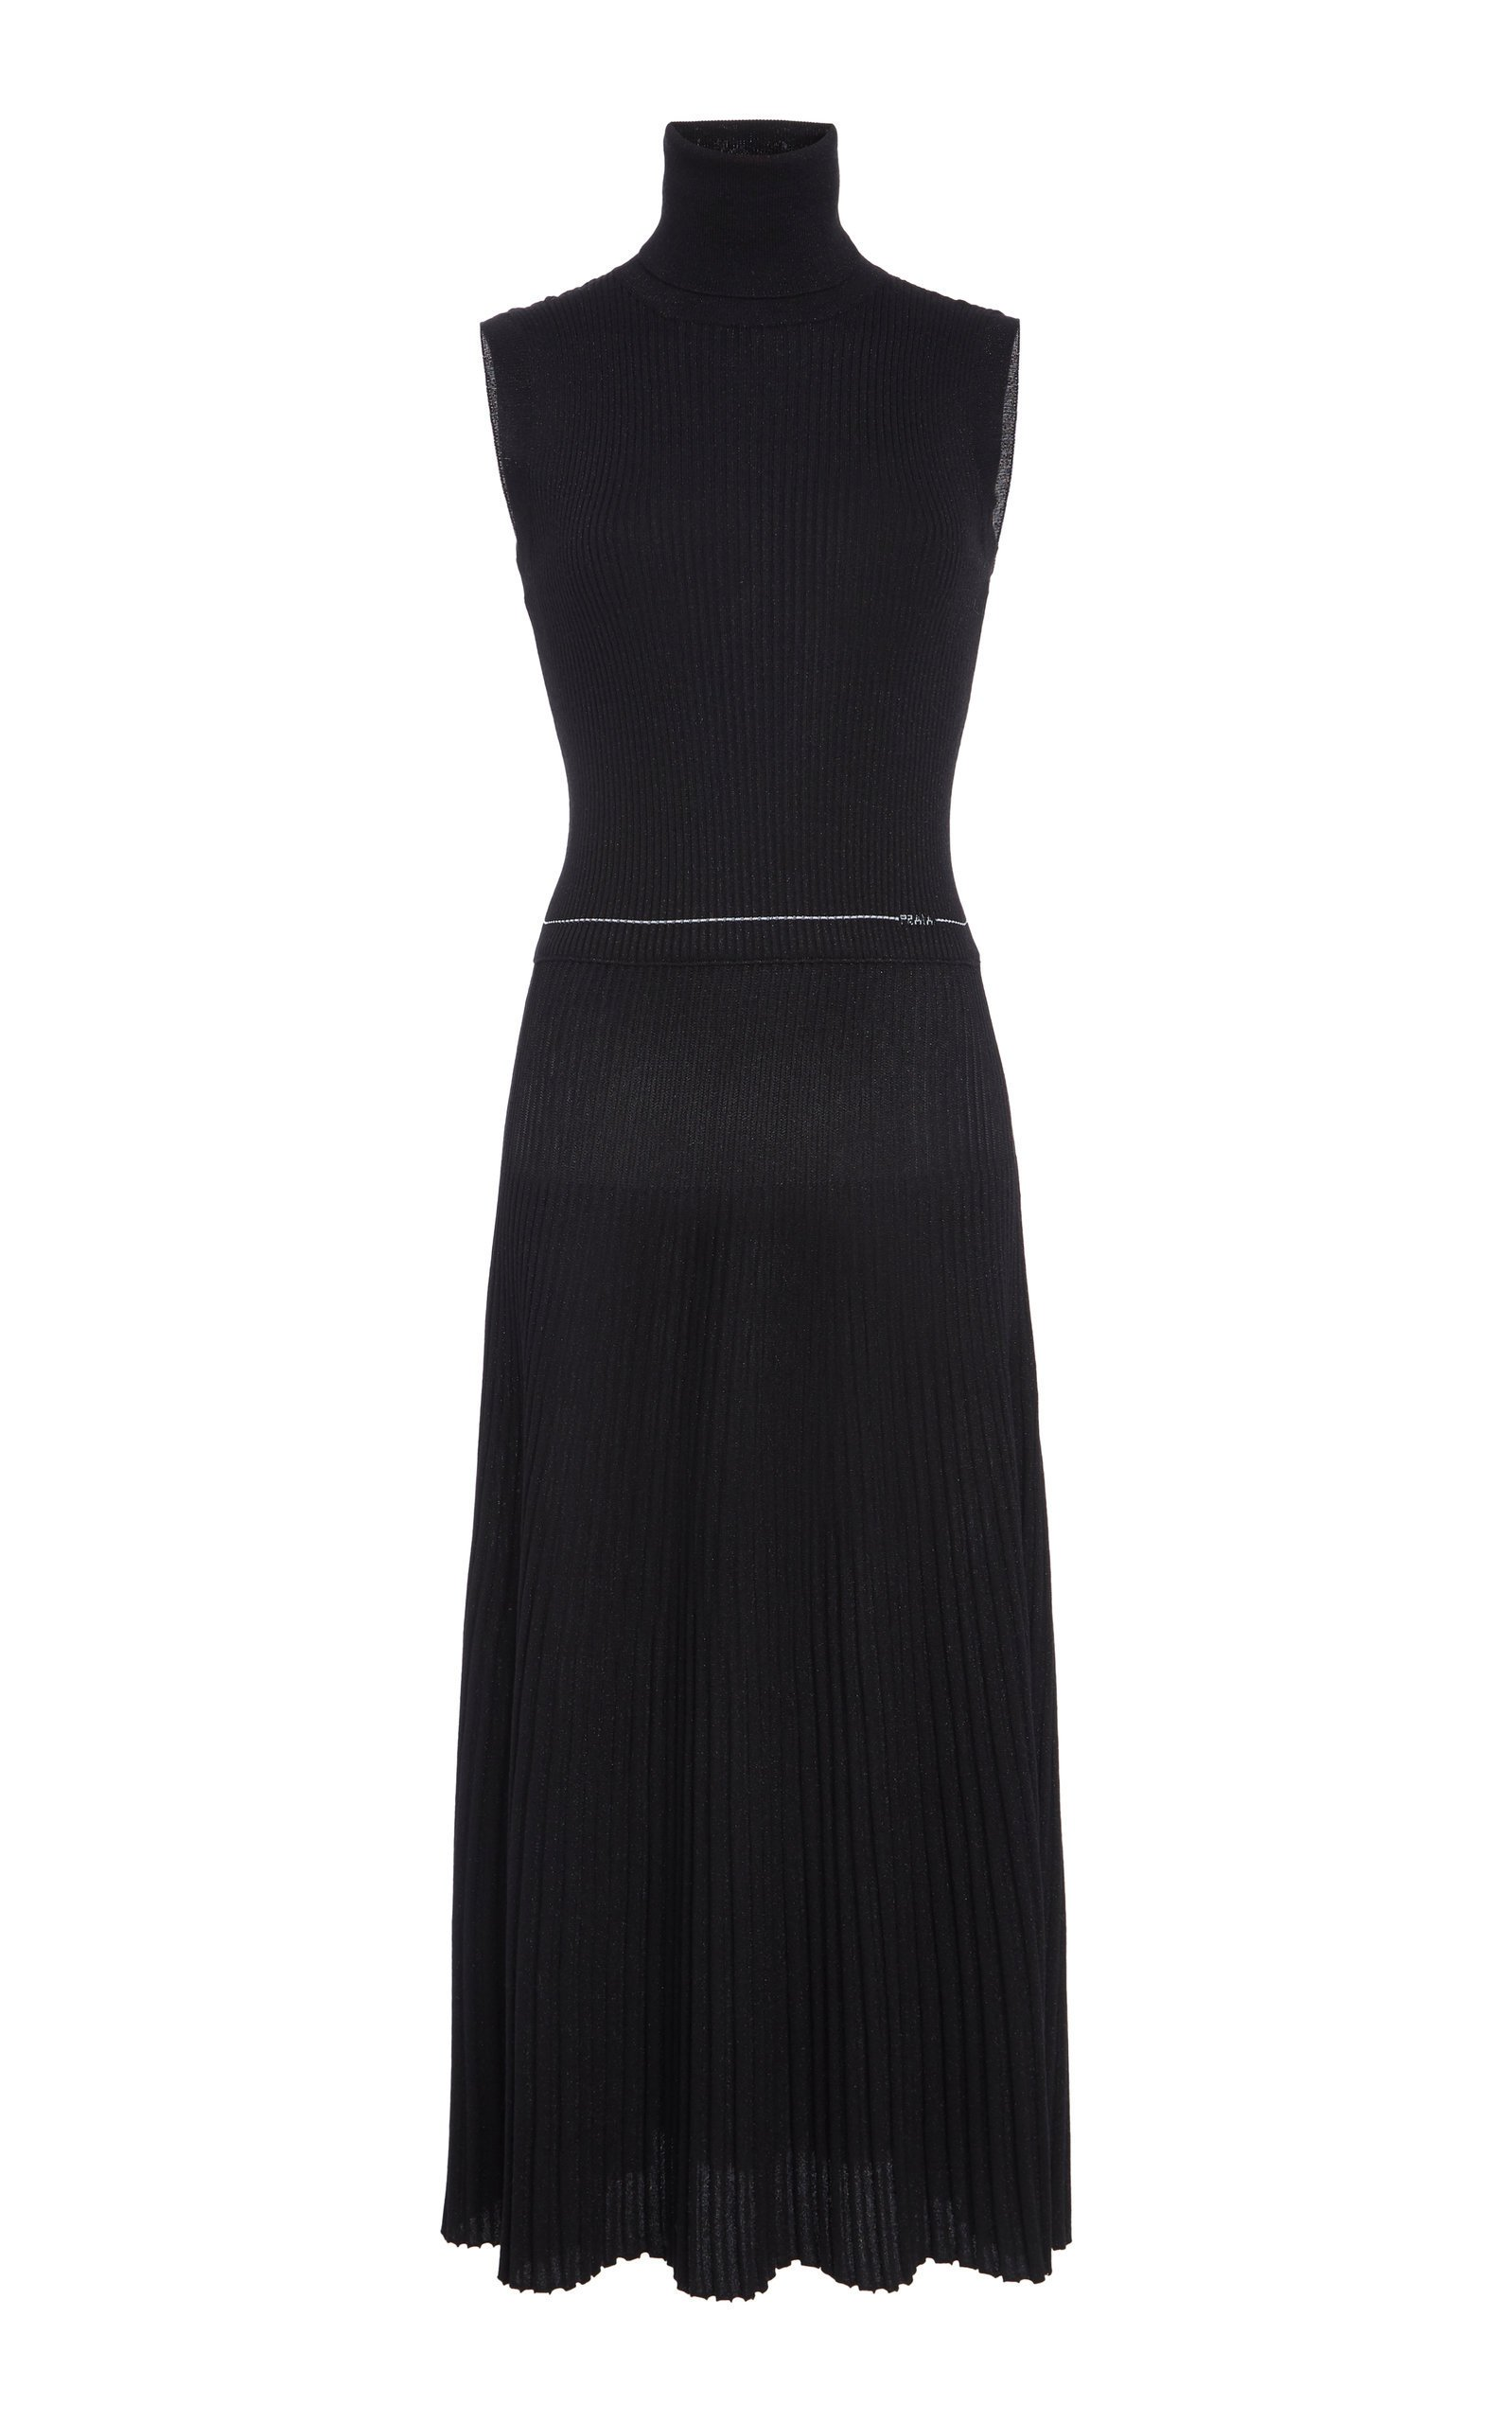 Prada Ribbed Knit Turtleneck Midi Dress